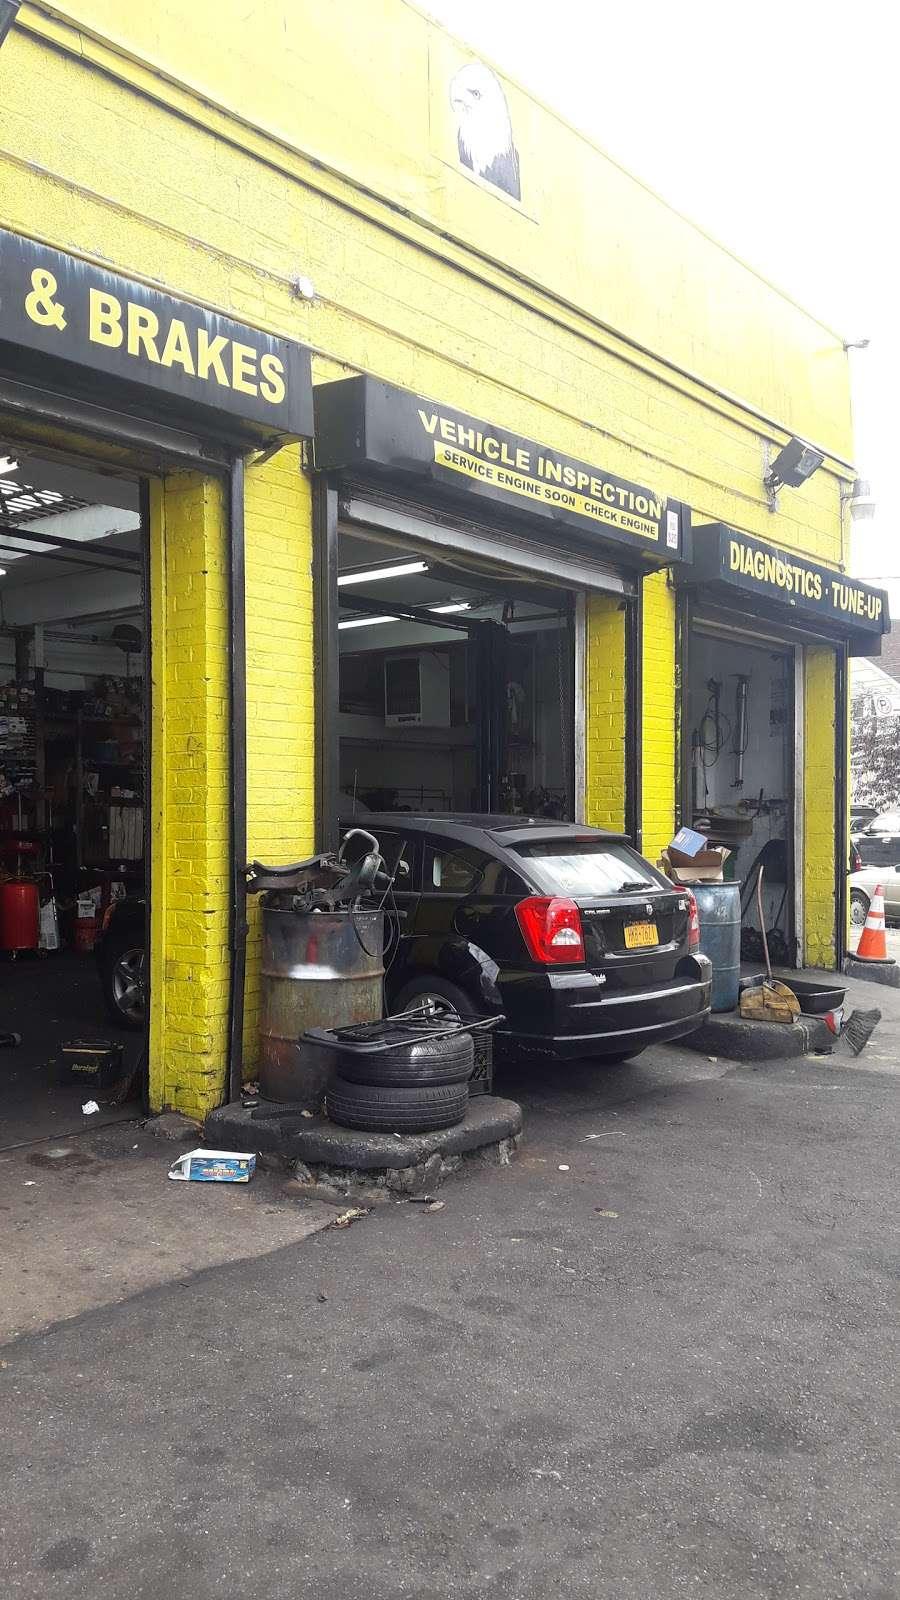 Eagle Auto Repair - car repair  | Photo 1 of 3 | Address: 1710 Flatbush Ave, Brooklyn, NY 11210, USA | Phone: (718) 677-8120